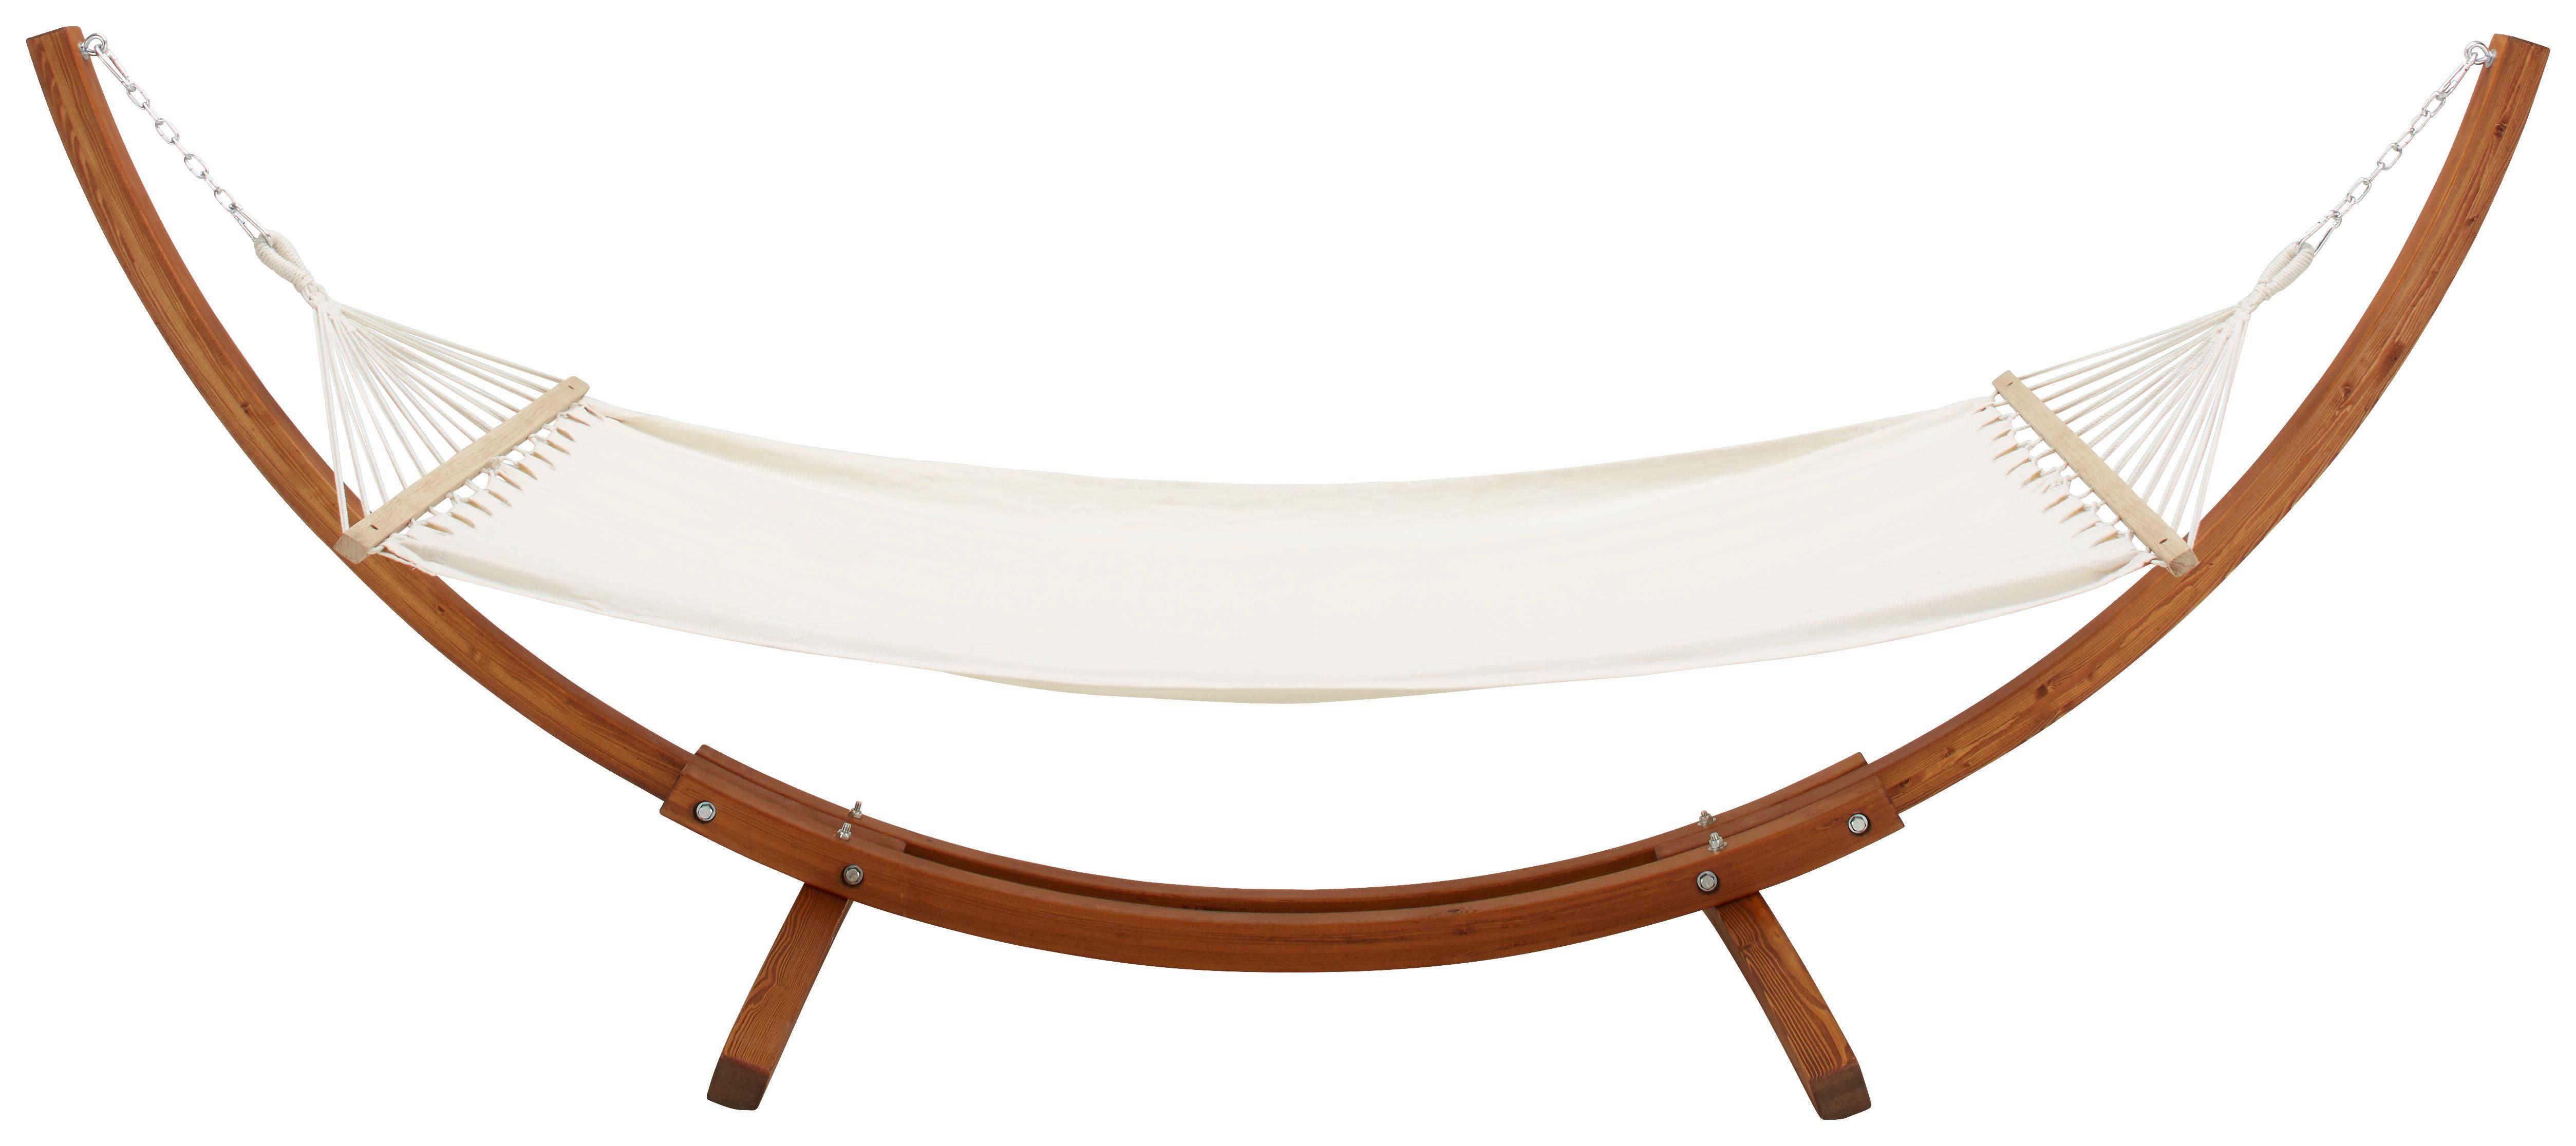 Hängematte Mesa - Creme/Teakfarben, MODERN, Holz/Textil (310/123/120cm) - Ombra